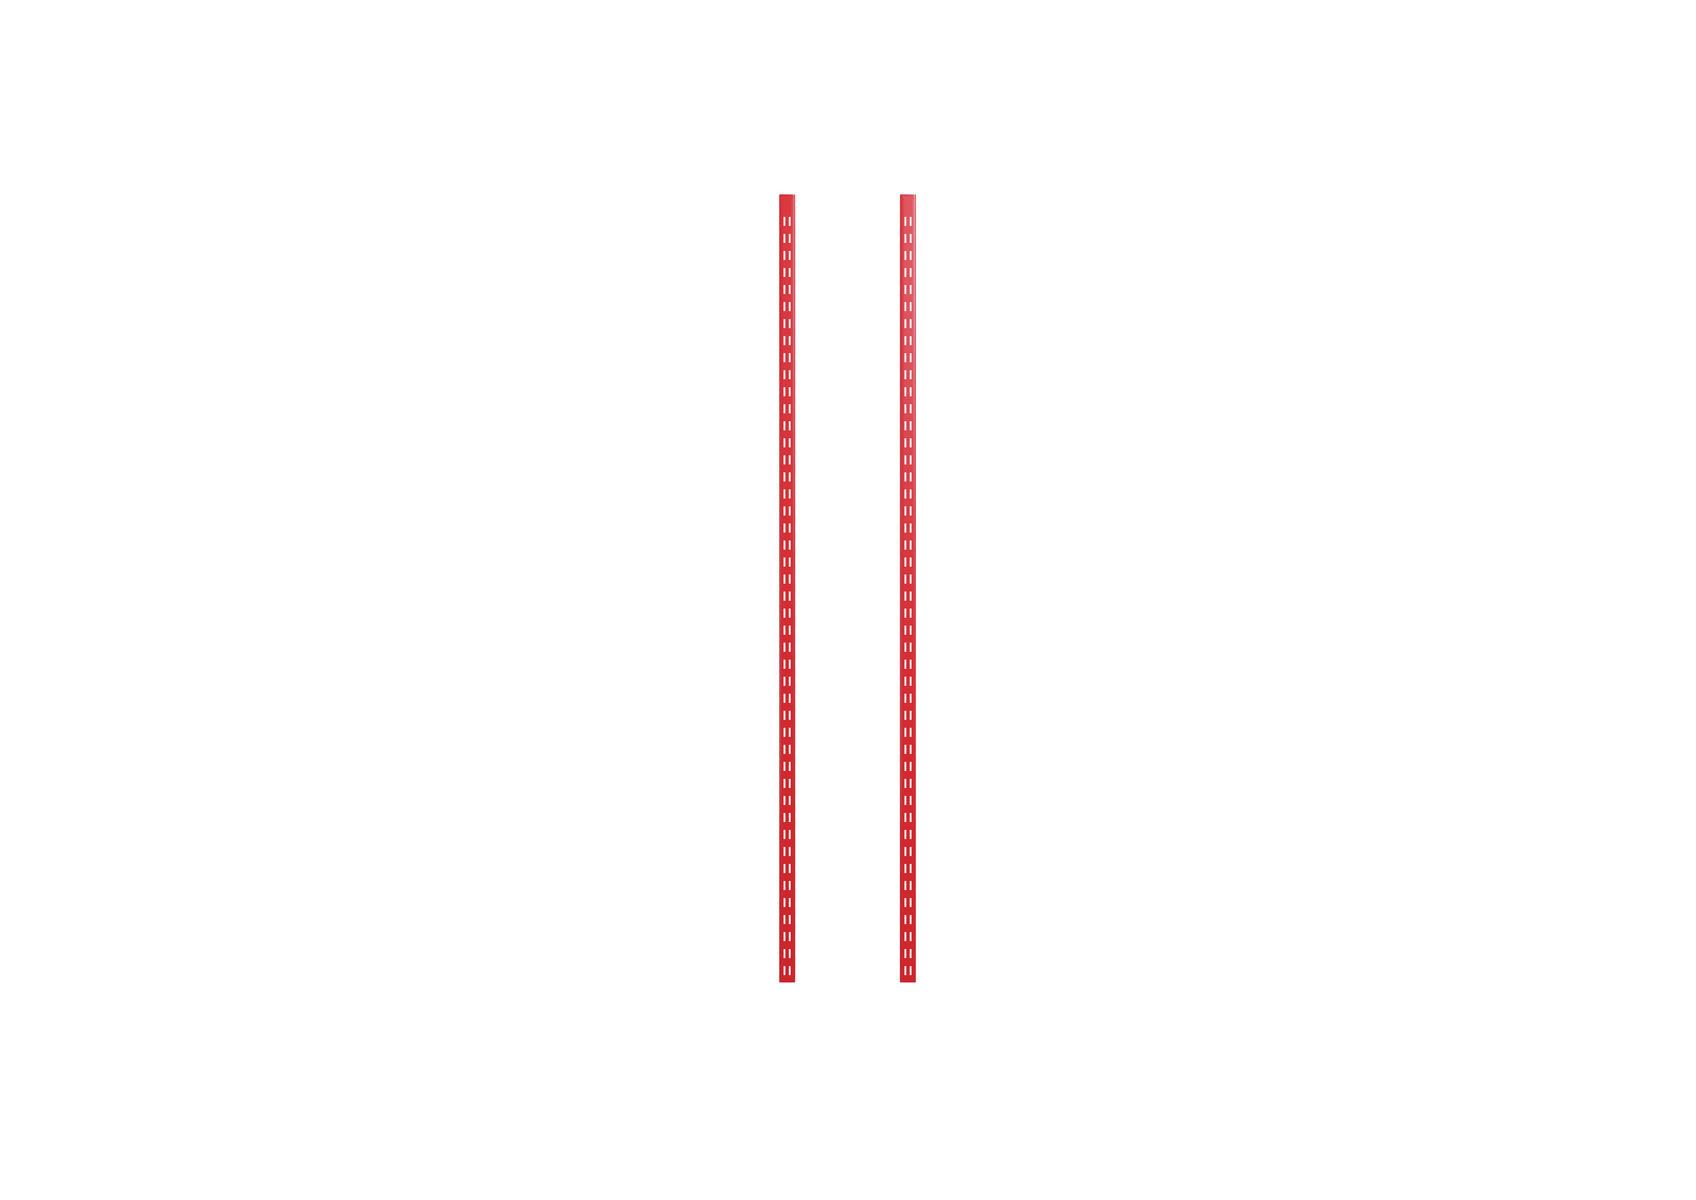 Wille v?gskinne grundmodul 150 cm - Lekolar Danmark